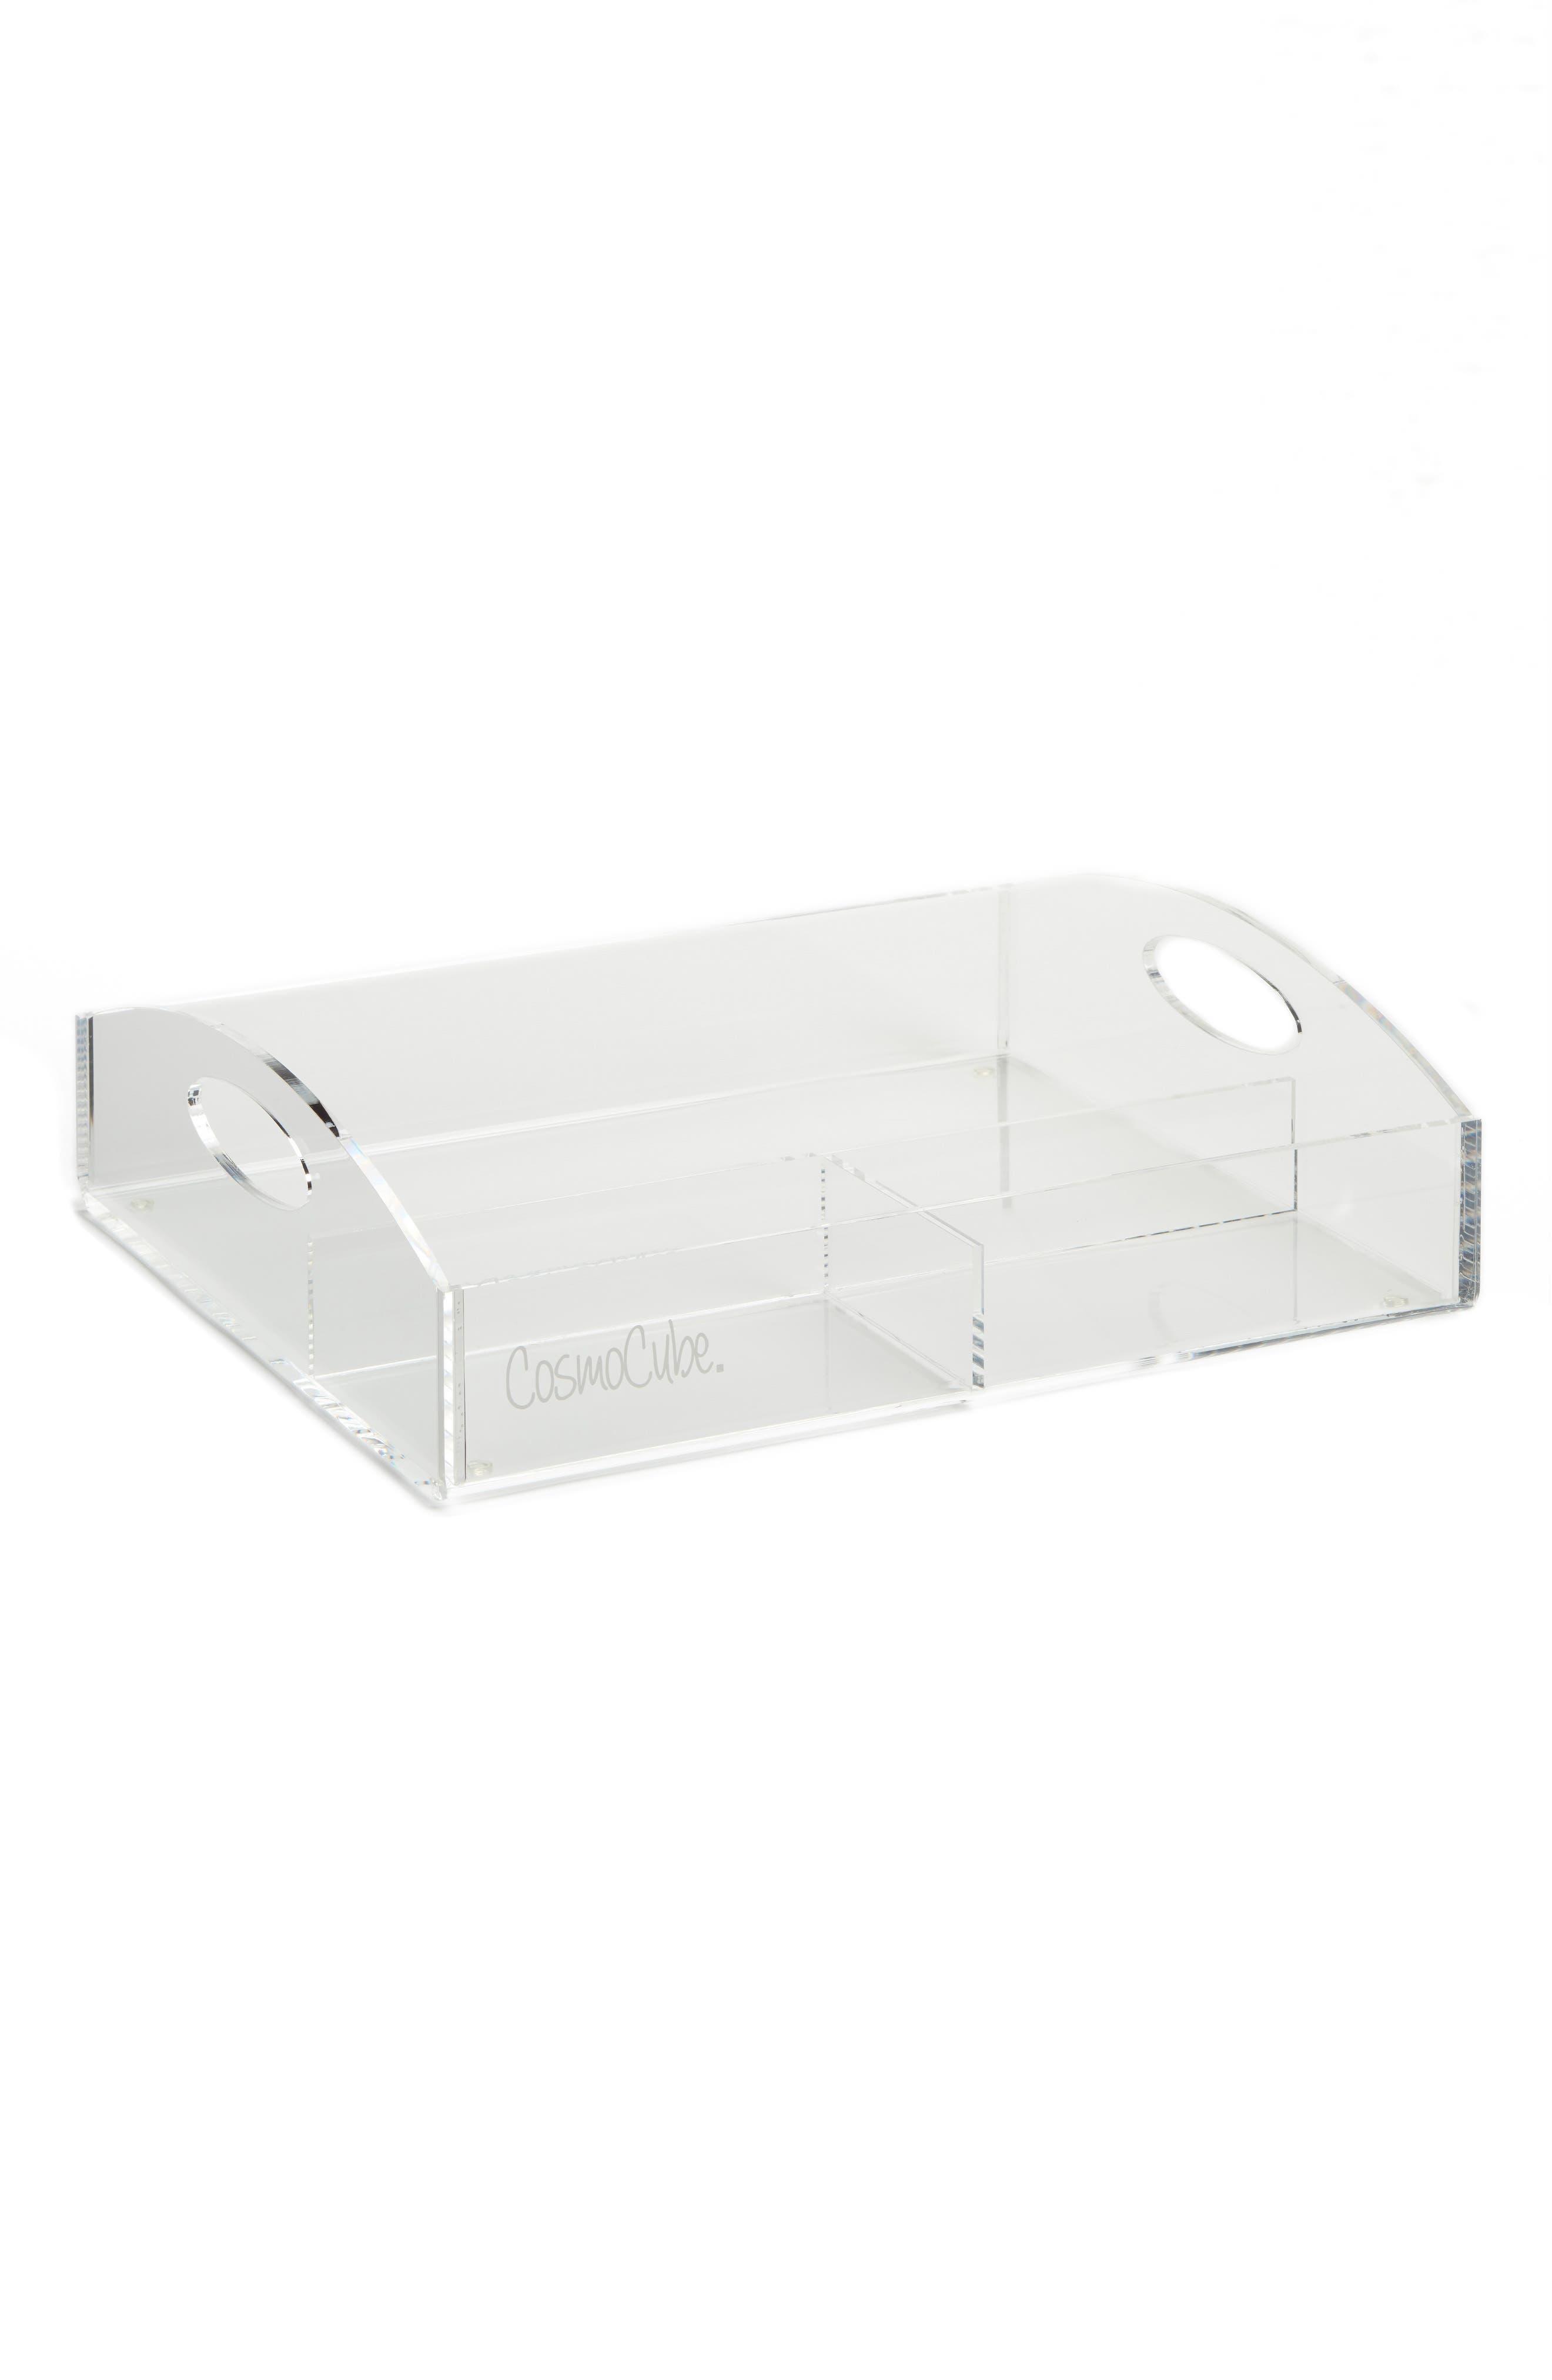 Alternate Image 1 Selected - CosmoCube® Vanity Tray